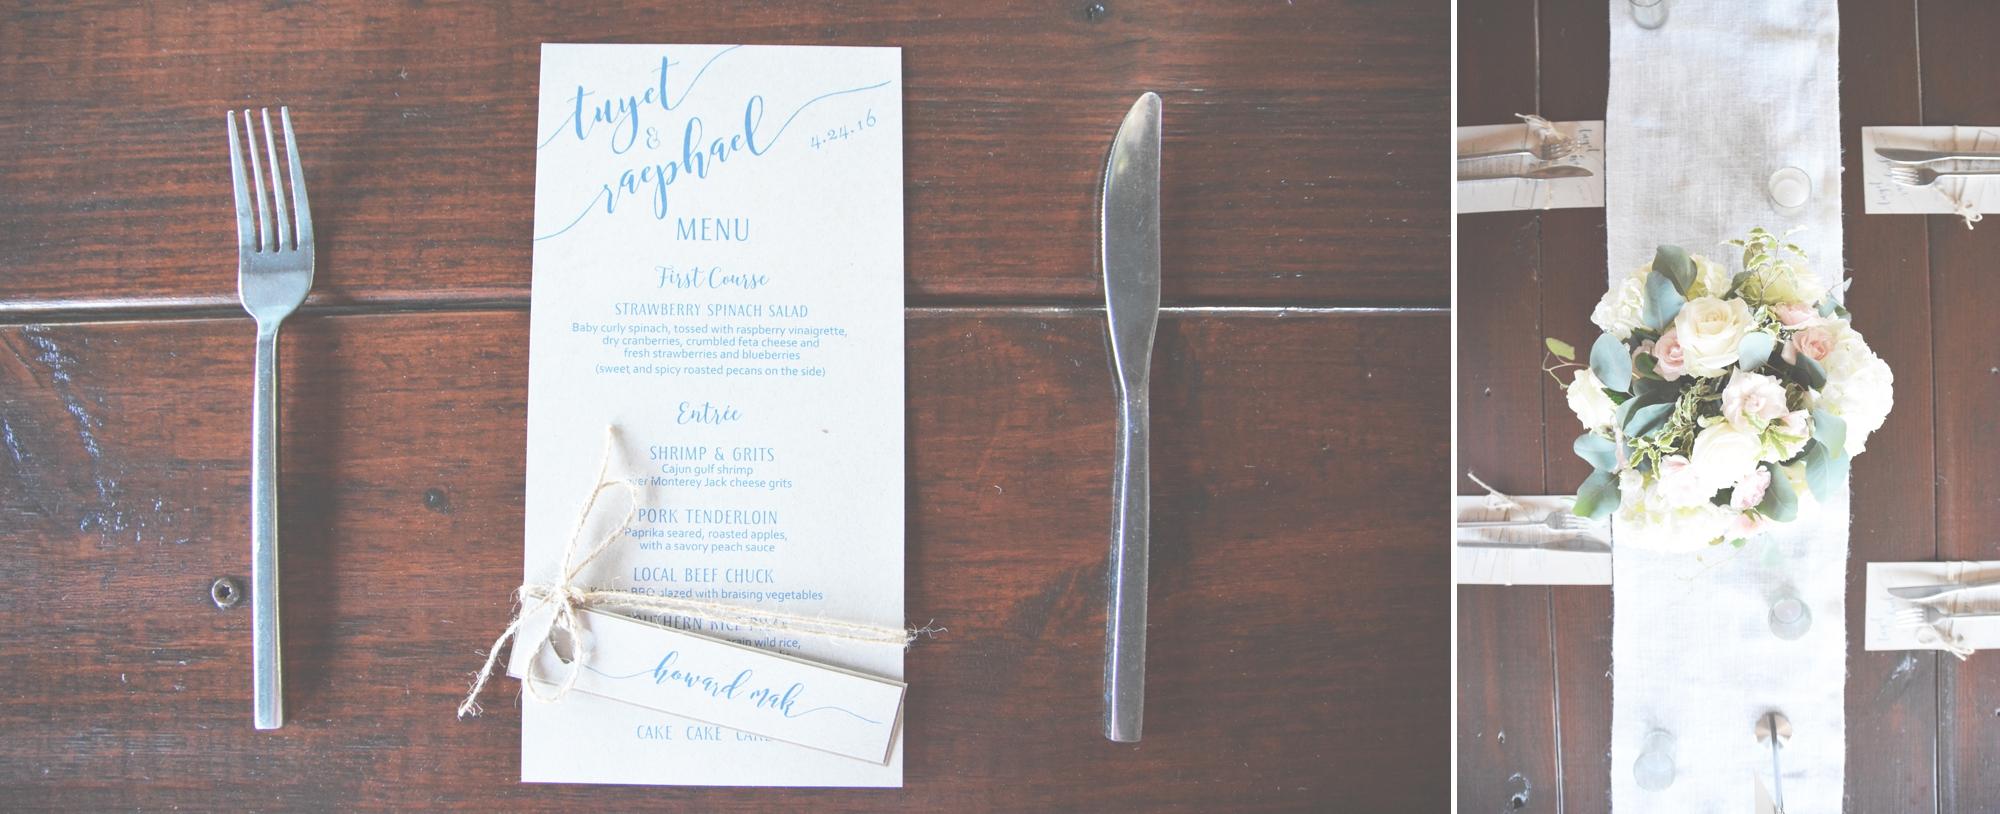 Wedding PhotoBooth - The Wright Farm - RobotBooth 3